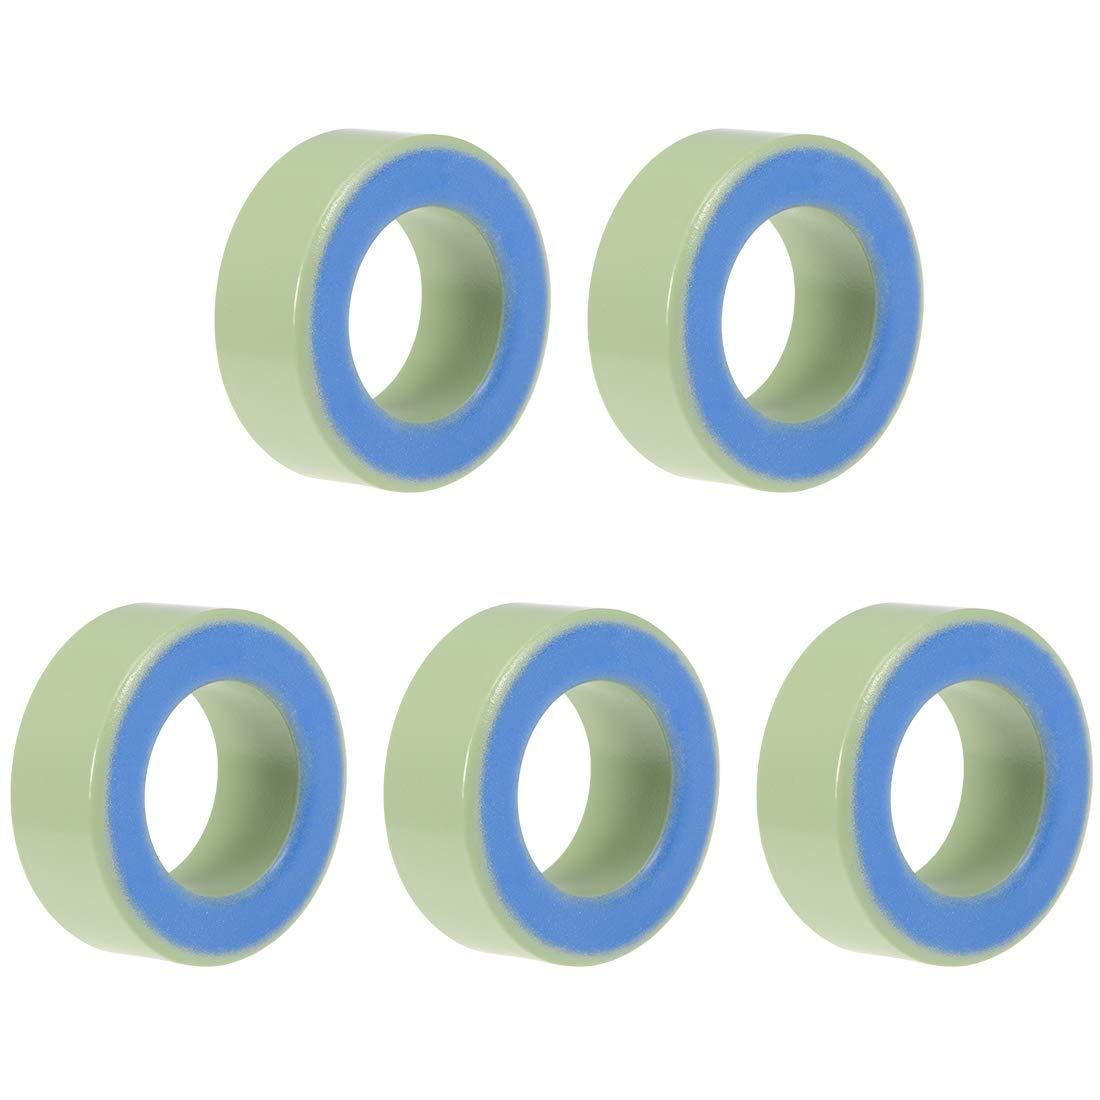 ZCHXD Toroid Core, Ferrite Chokes Ring Iron Powder Inductor Ferrite Rings, Light Green Blue 5pcs, 26.9 x 45 x 16.8mm